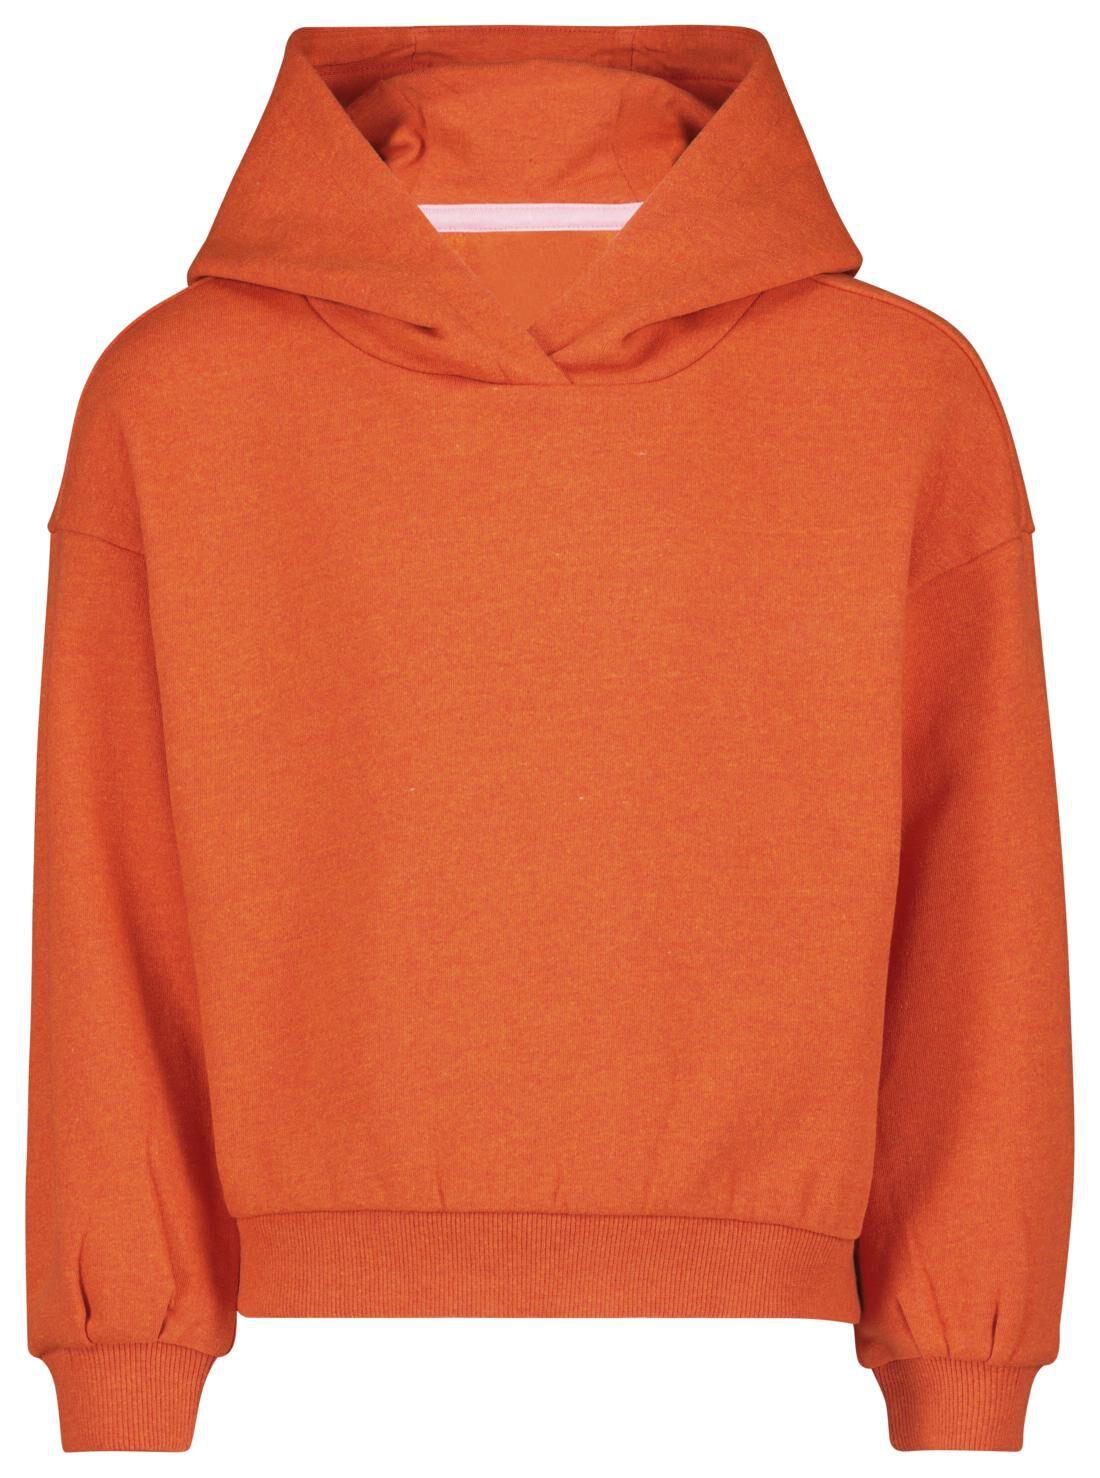 HEMA Kinder Capuchonsweater - Recycled Katoen Rood (rood)